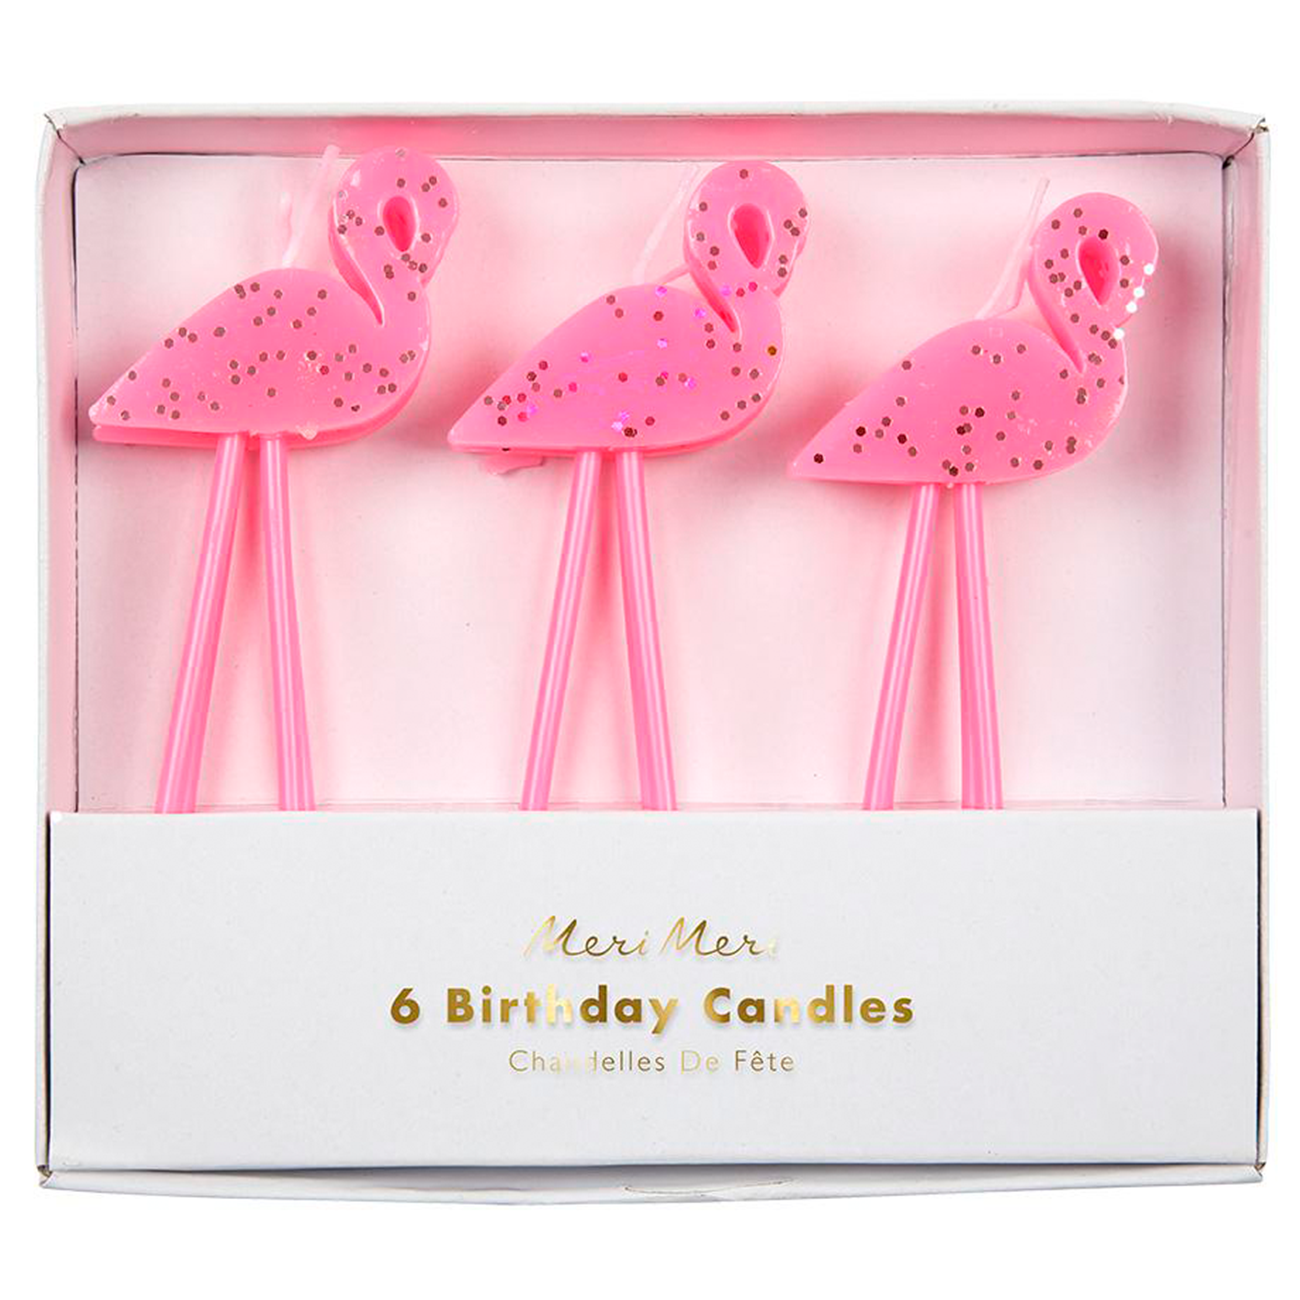 Meri Meri Bird Candles